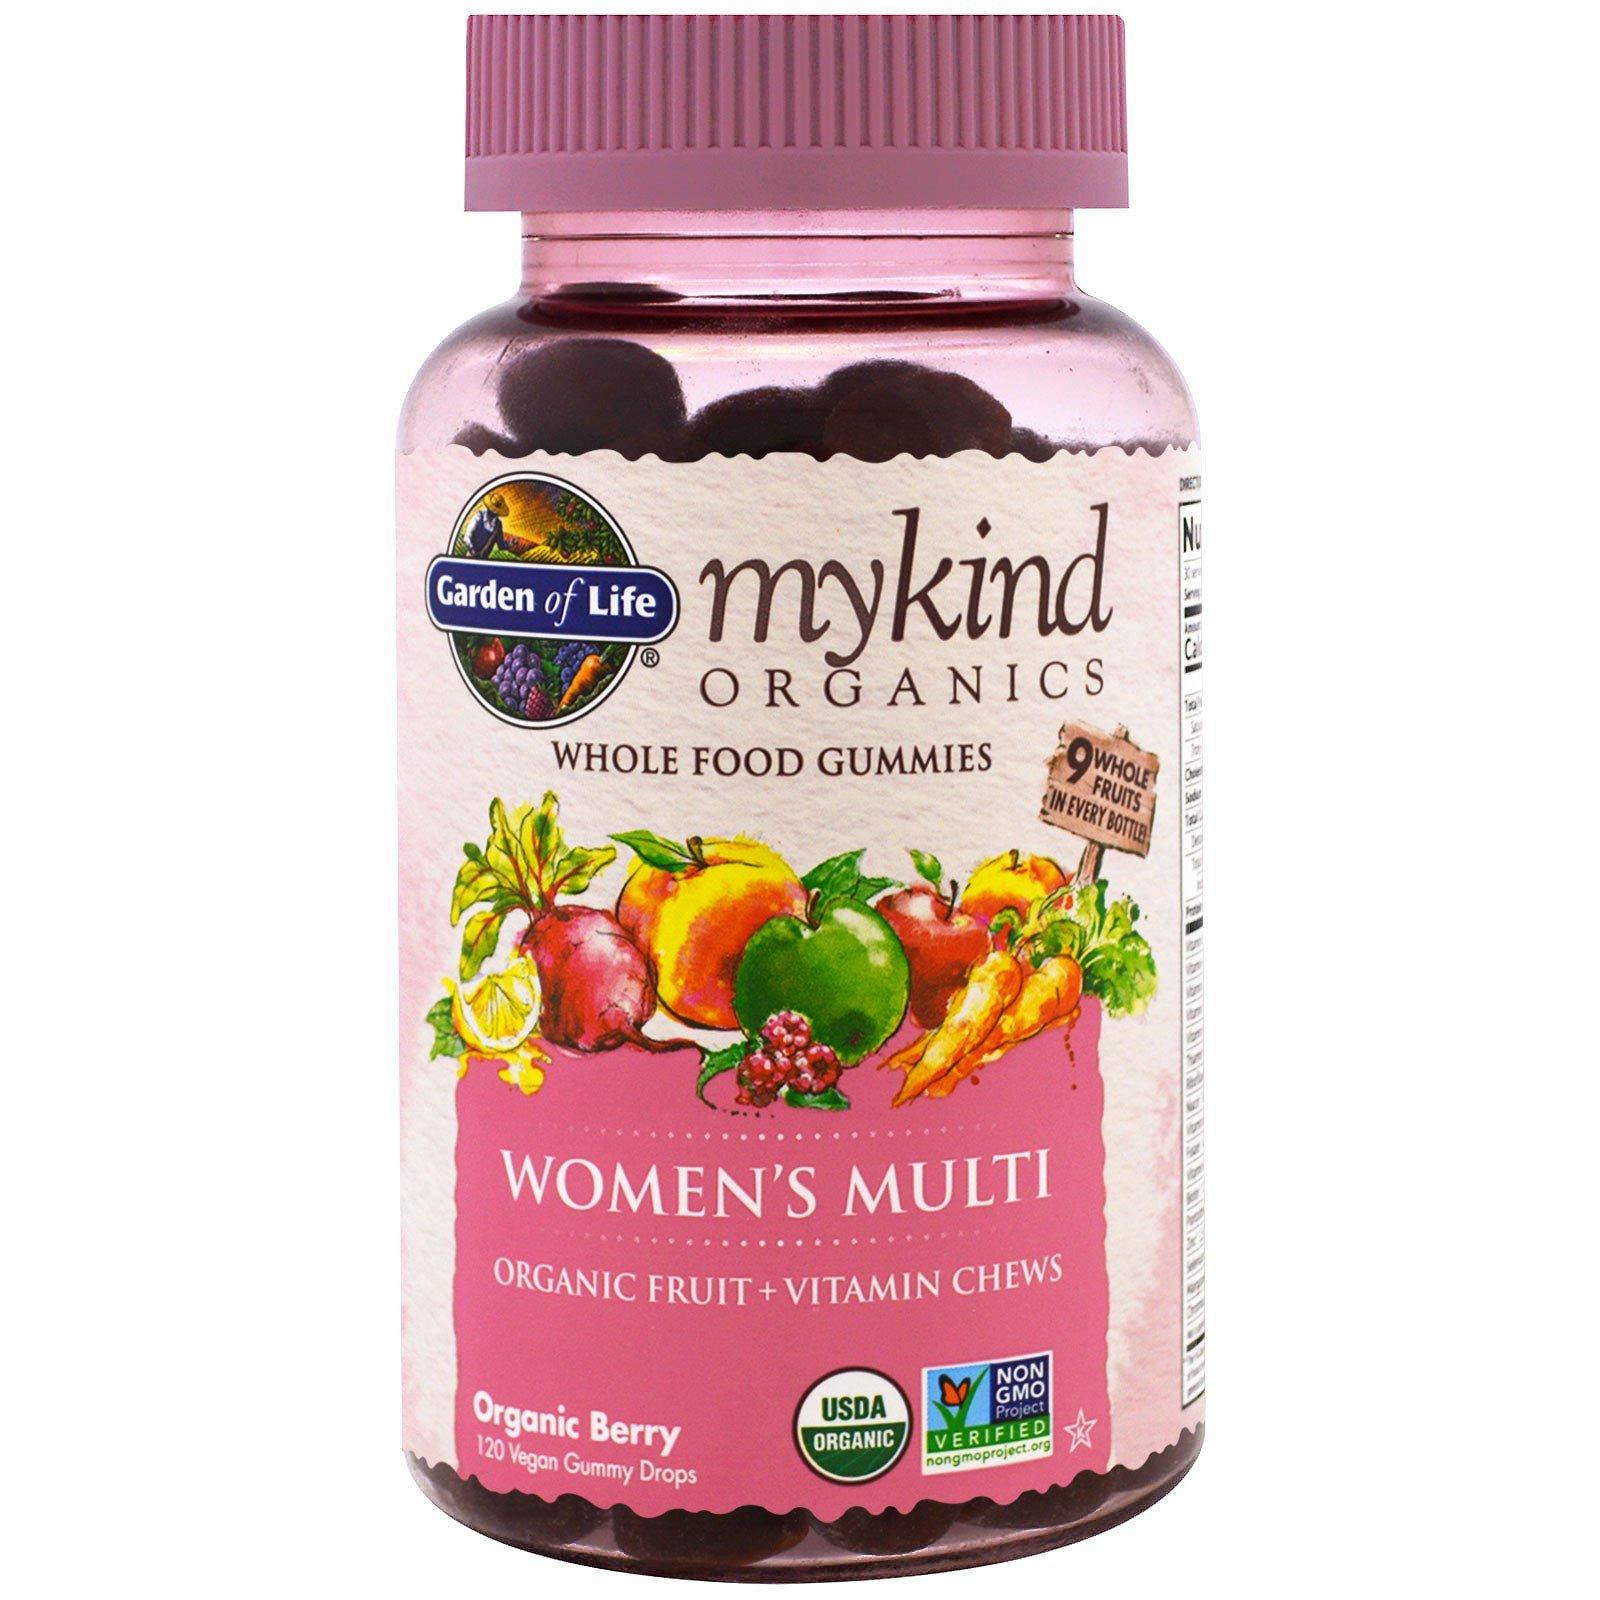 Garden of Life, Mykind Organics, Women's Multi, Organic Berry, 120 Gummy Drops